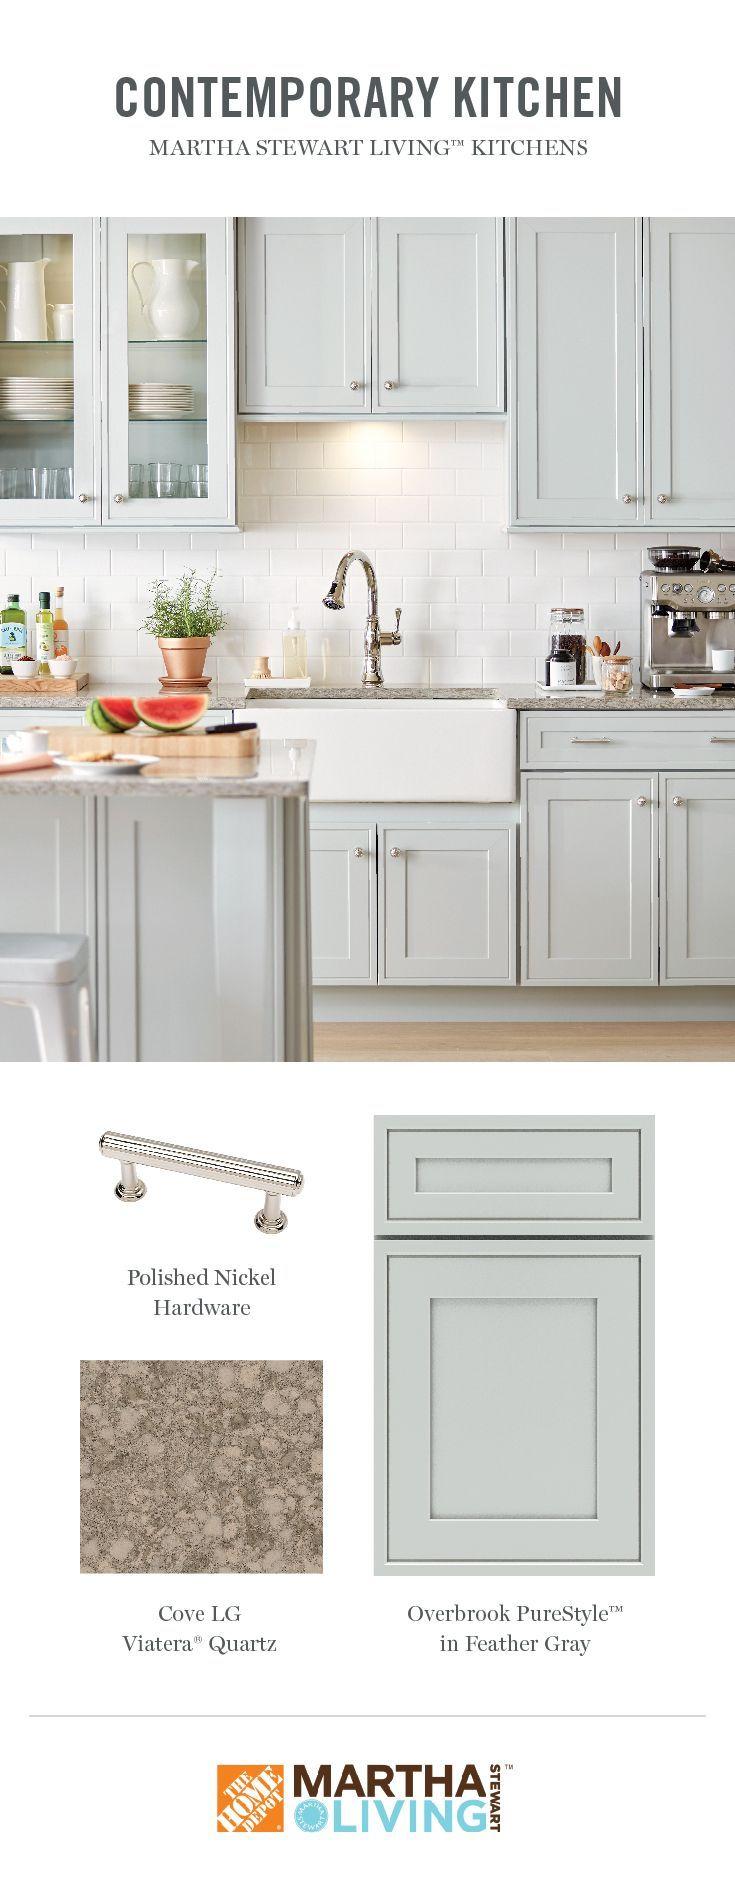 Grey Kitchen Cabinets With Espresso Island Redo Kitchen Cabinets Martha Stewart Living Kitchen Kitchen Renovation